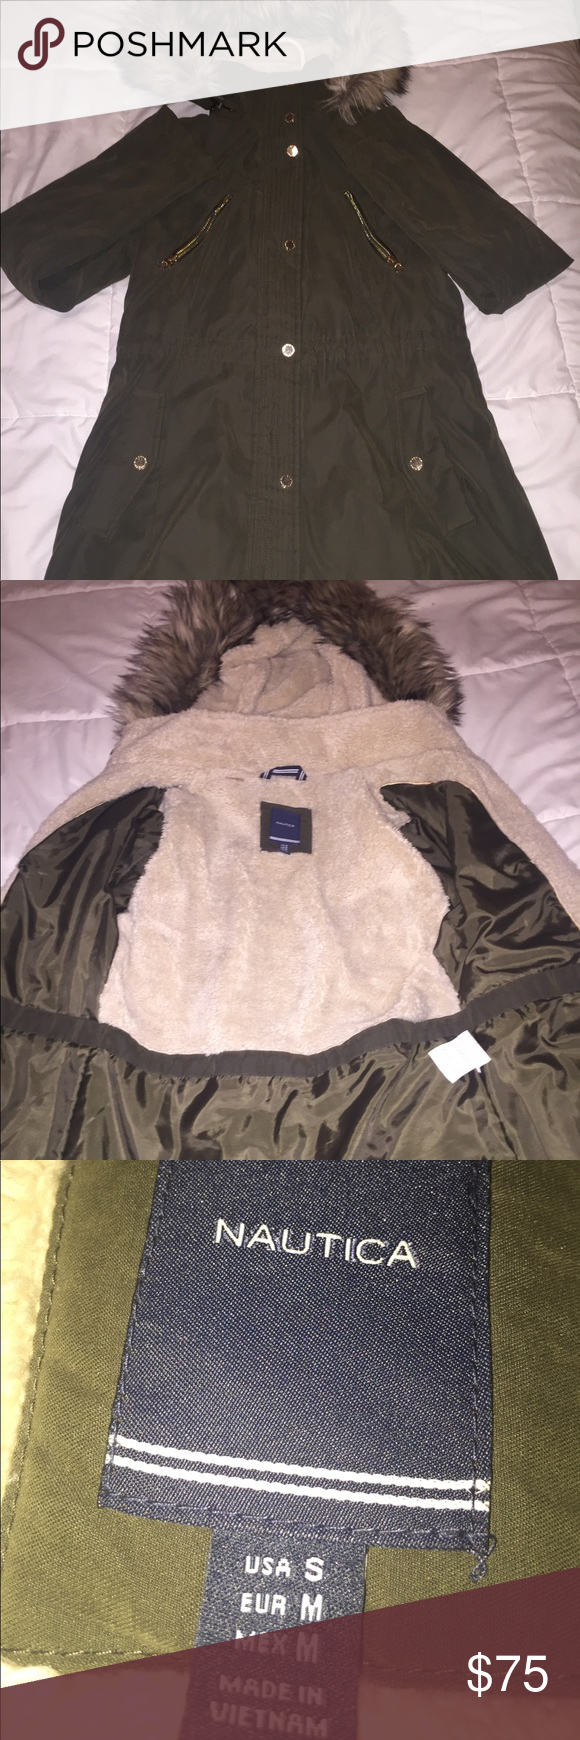 Nautica Winter Jacket Faux Fur Removable Hood Faux Fur Jacket Winter Jackets Jackets [ 1740 x 580 Pixel ]